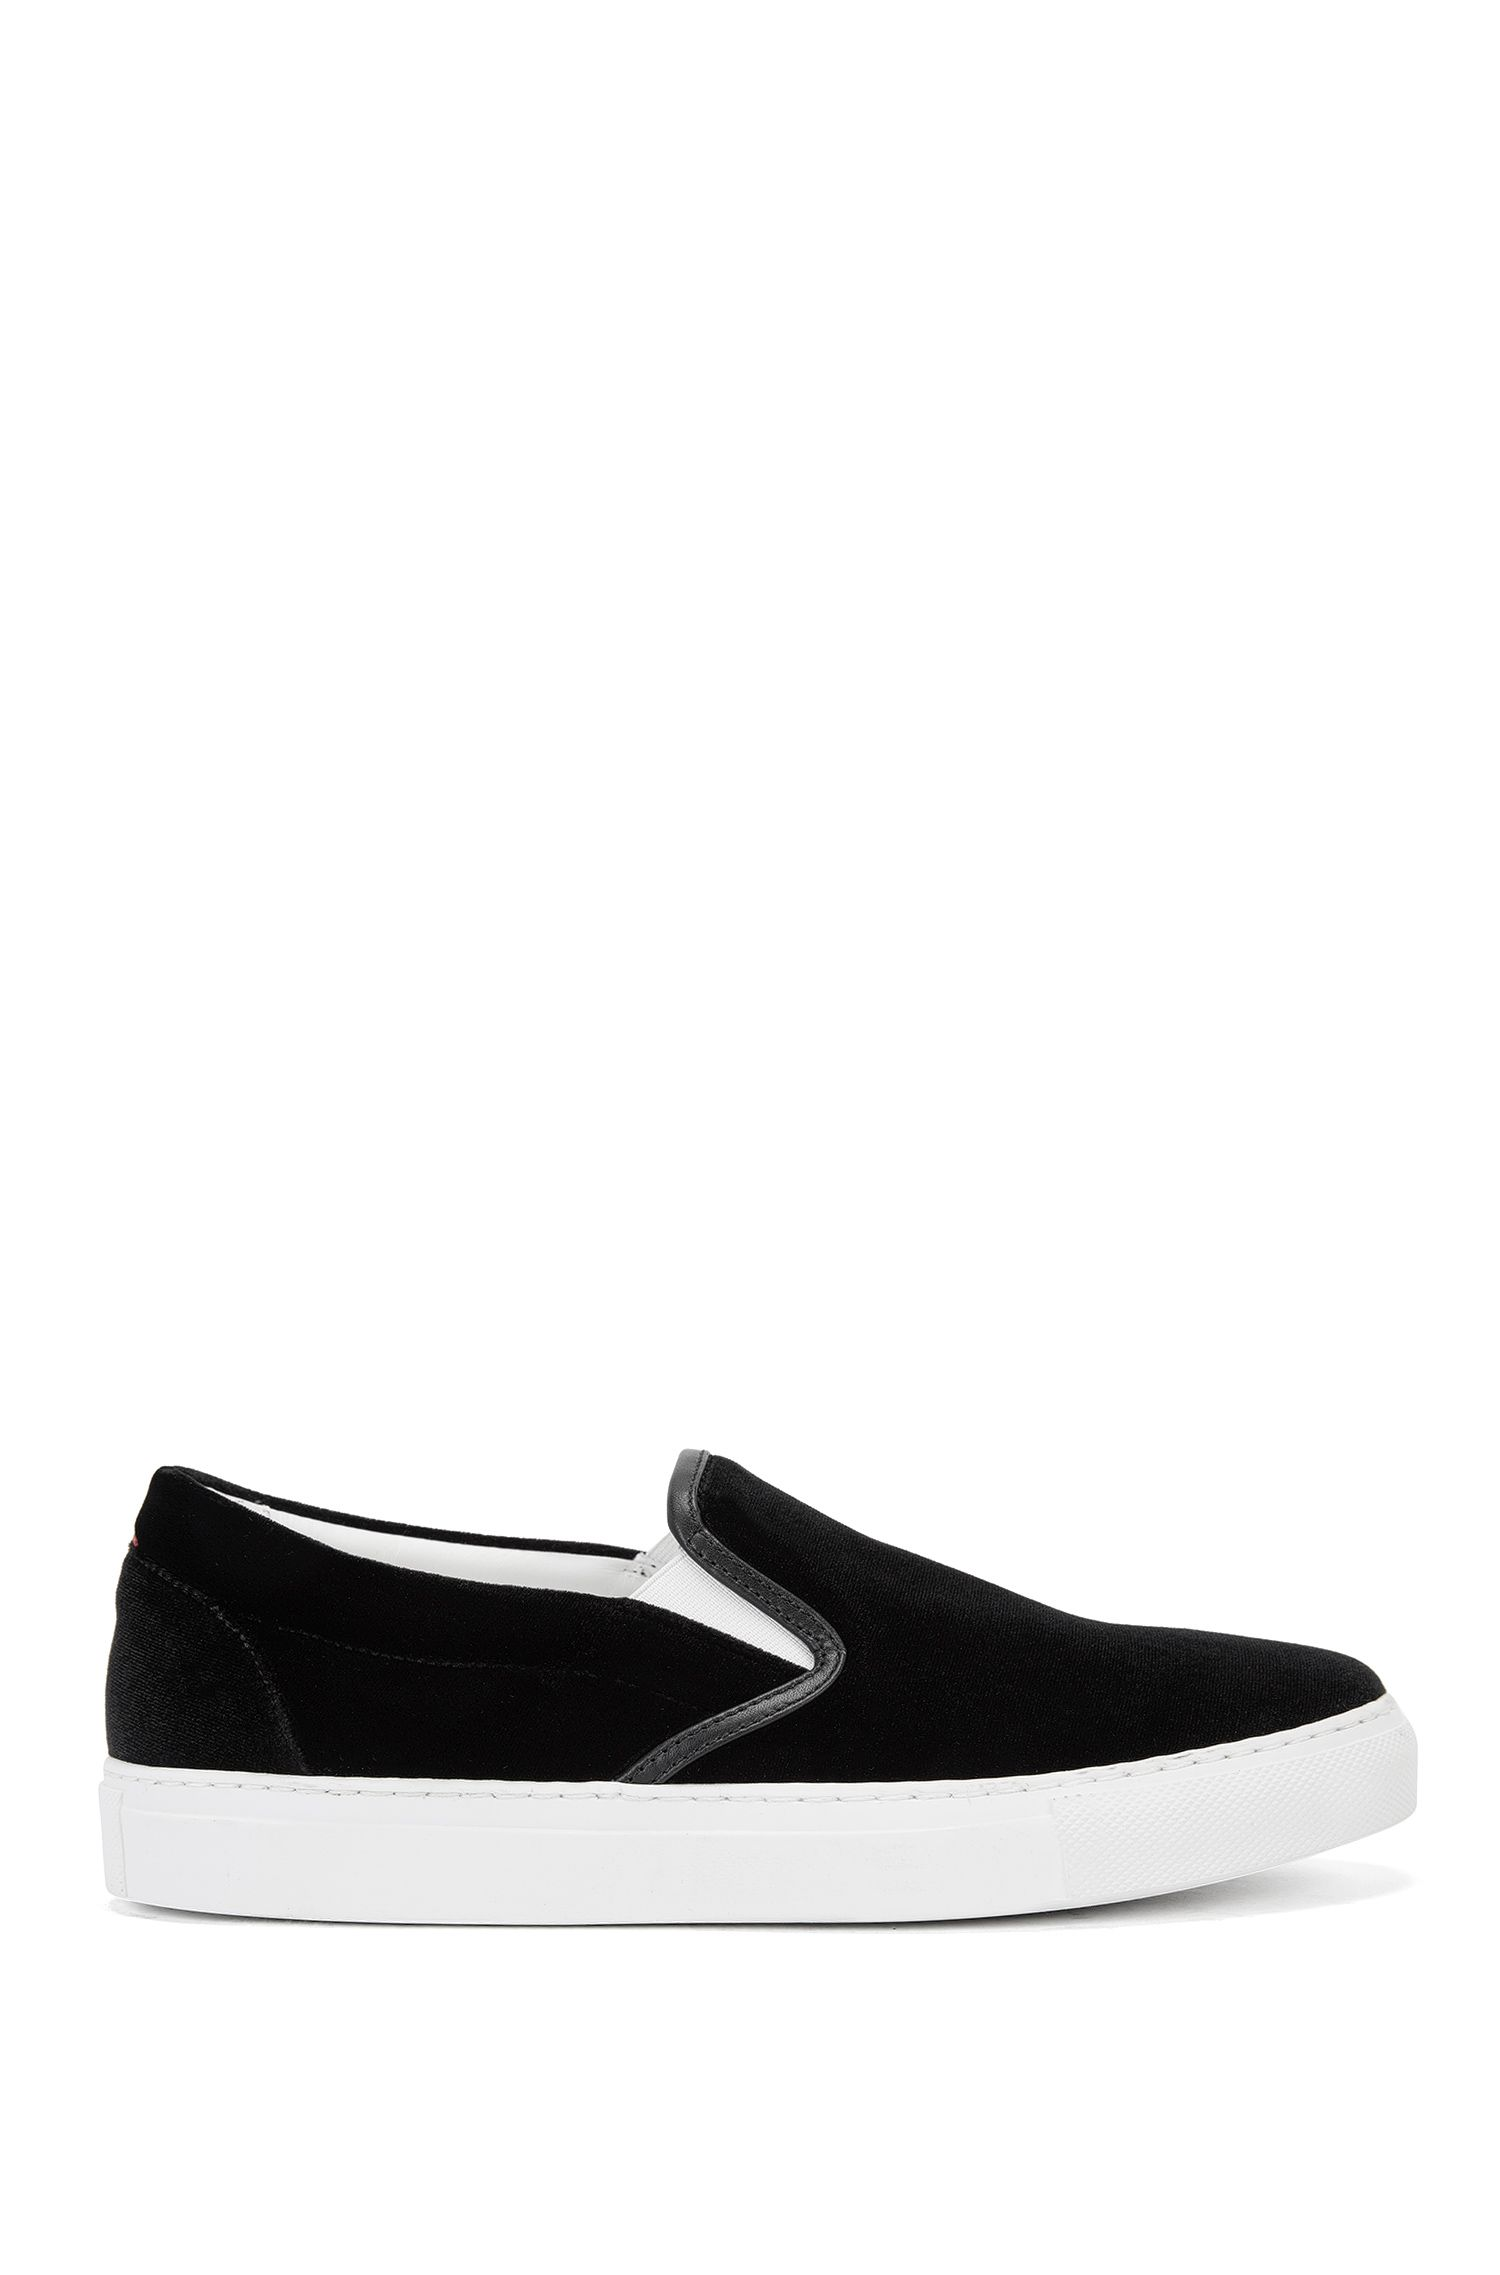 Slip-on trainers in smooth velvet